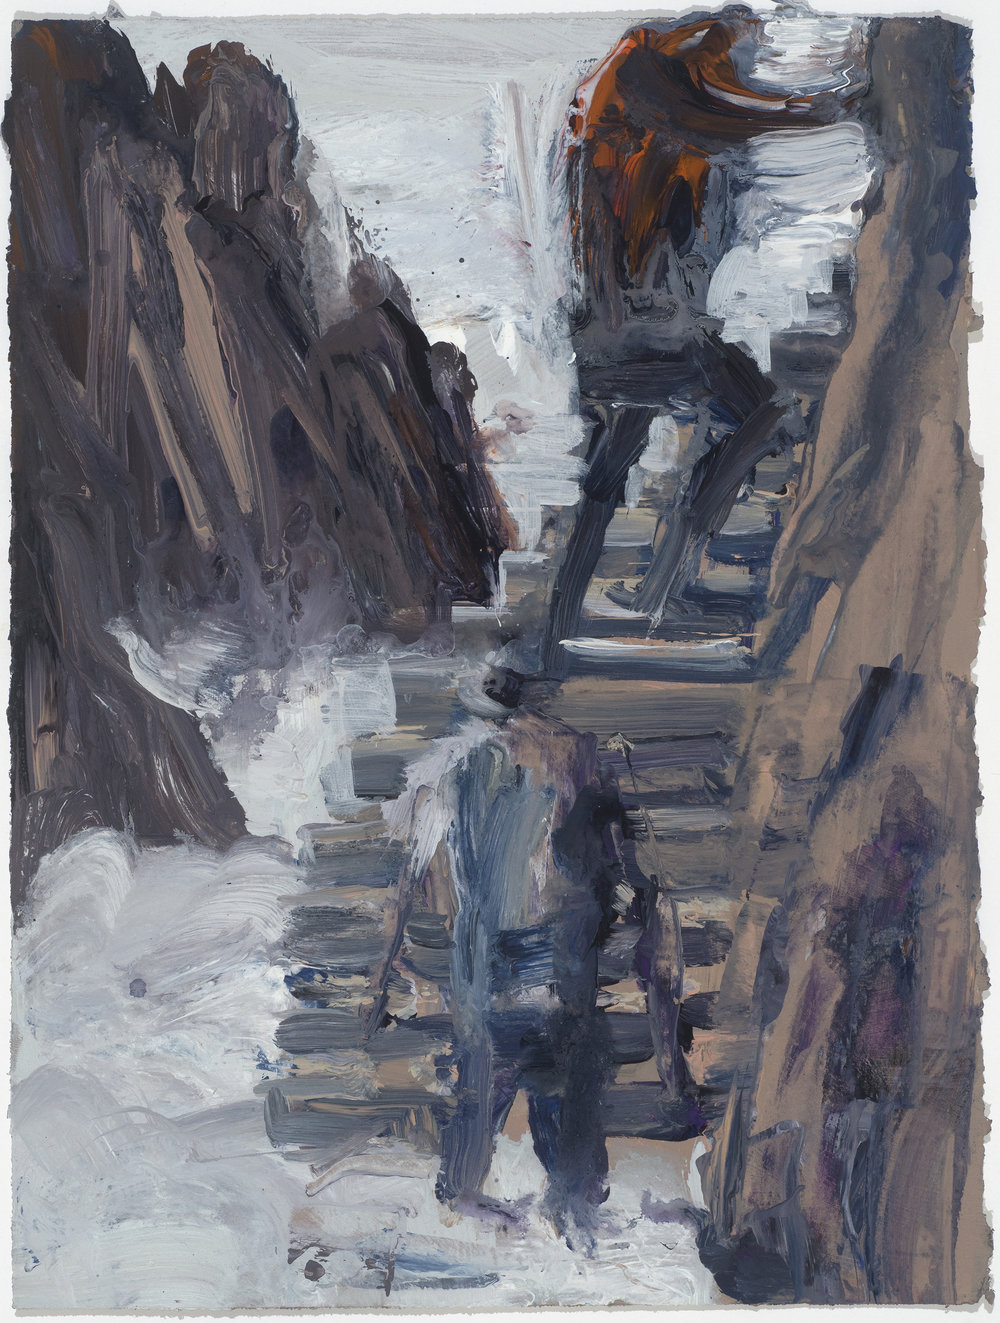 Stairs & mist study